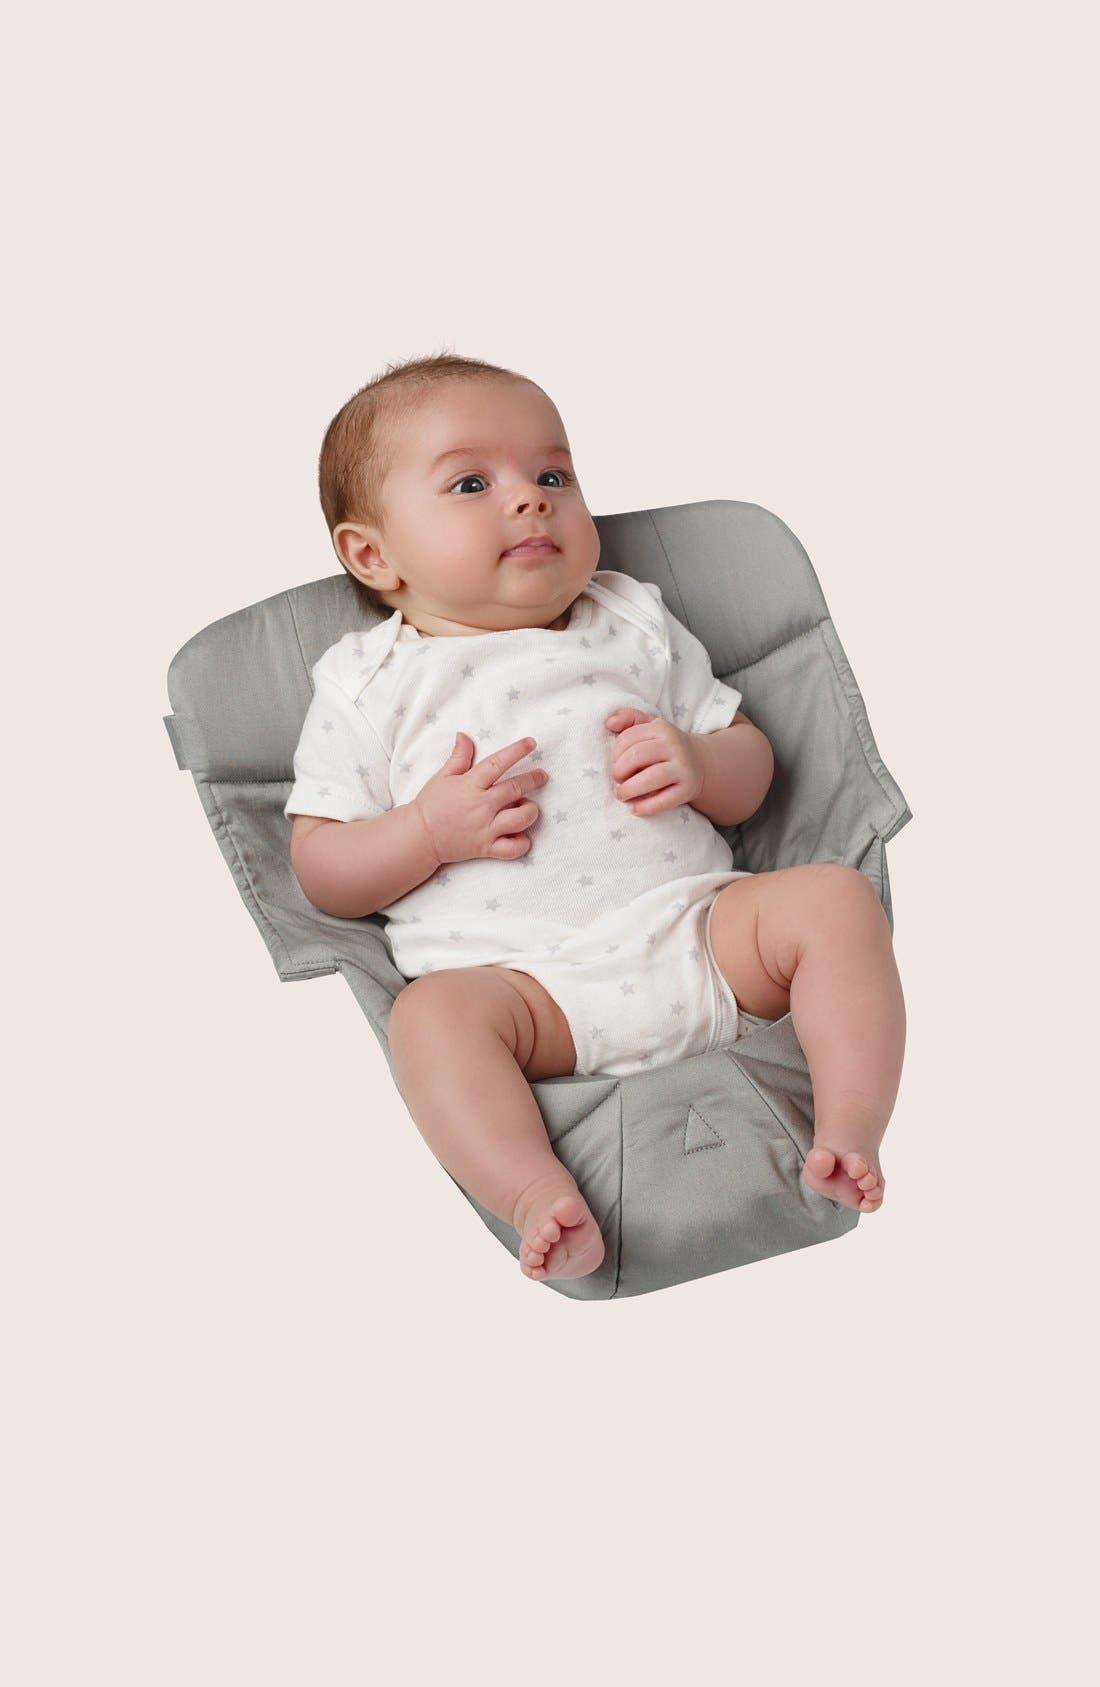 'Easy Snug' Cotton Poplin Baby Insert,                             Main thumbnail 1, color,                             Grey